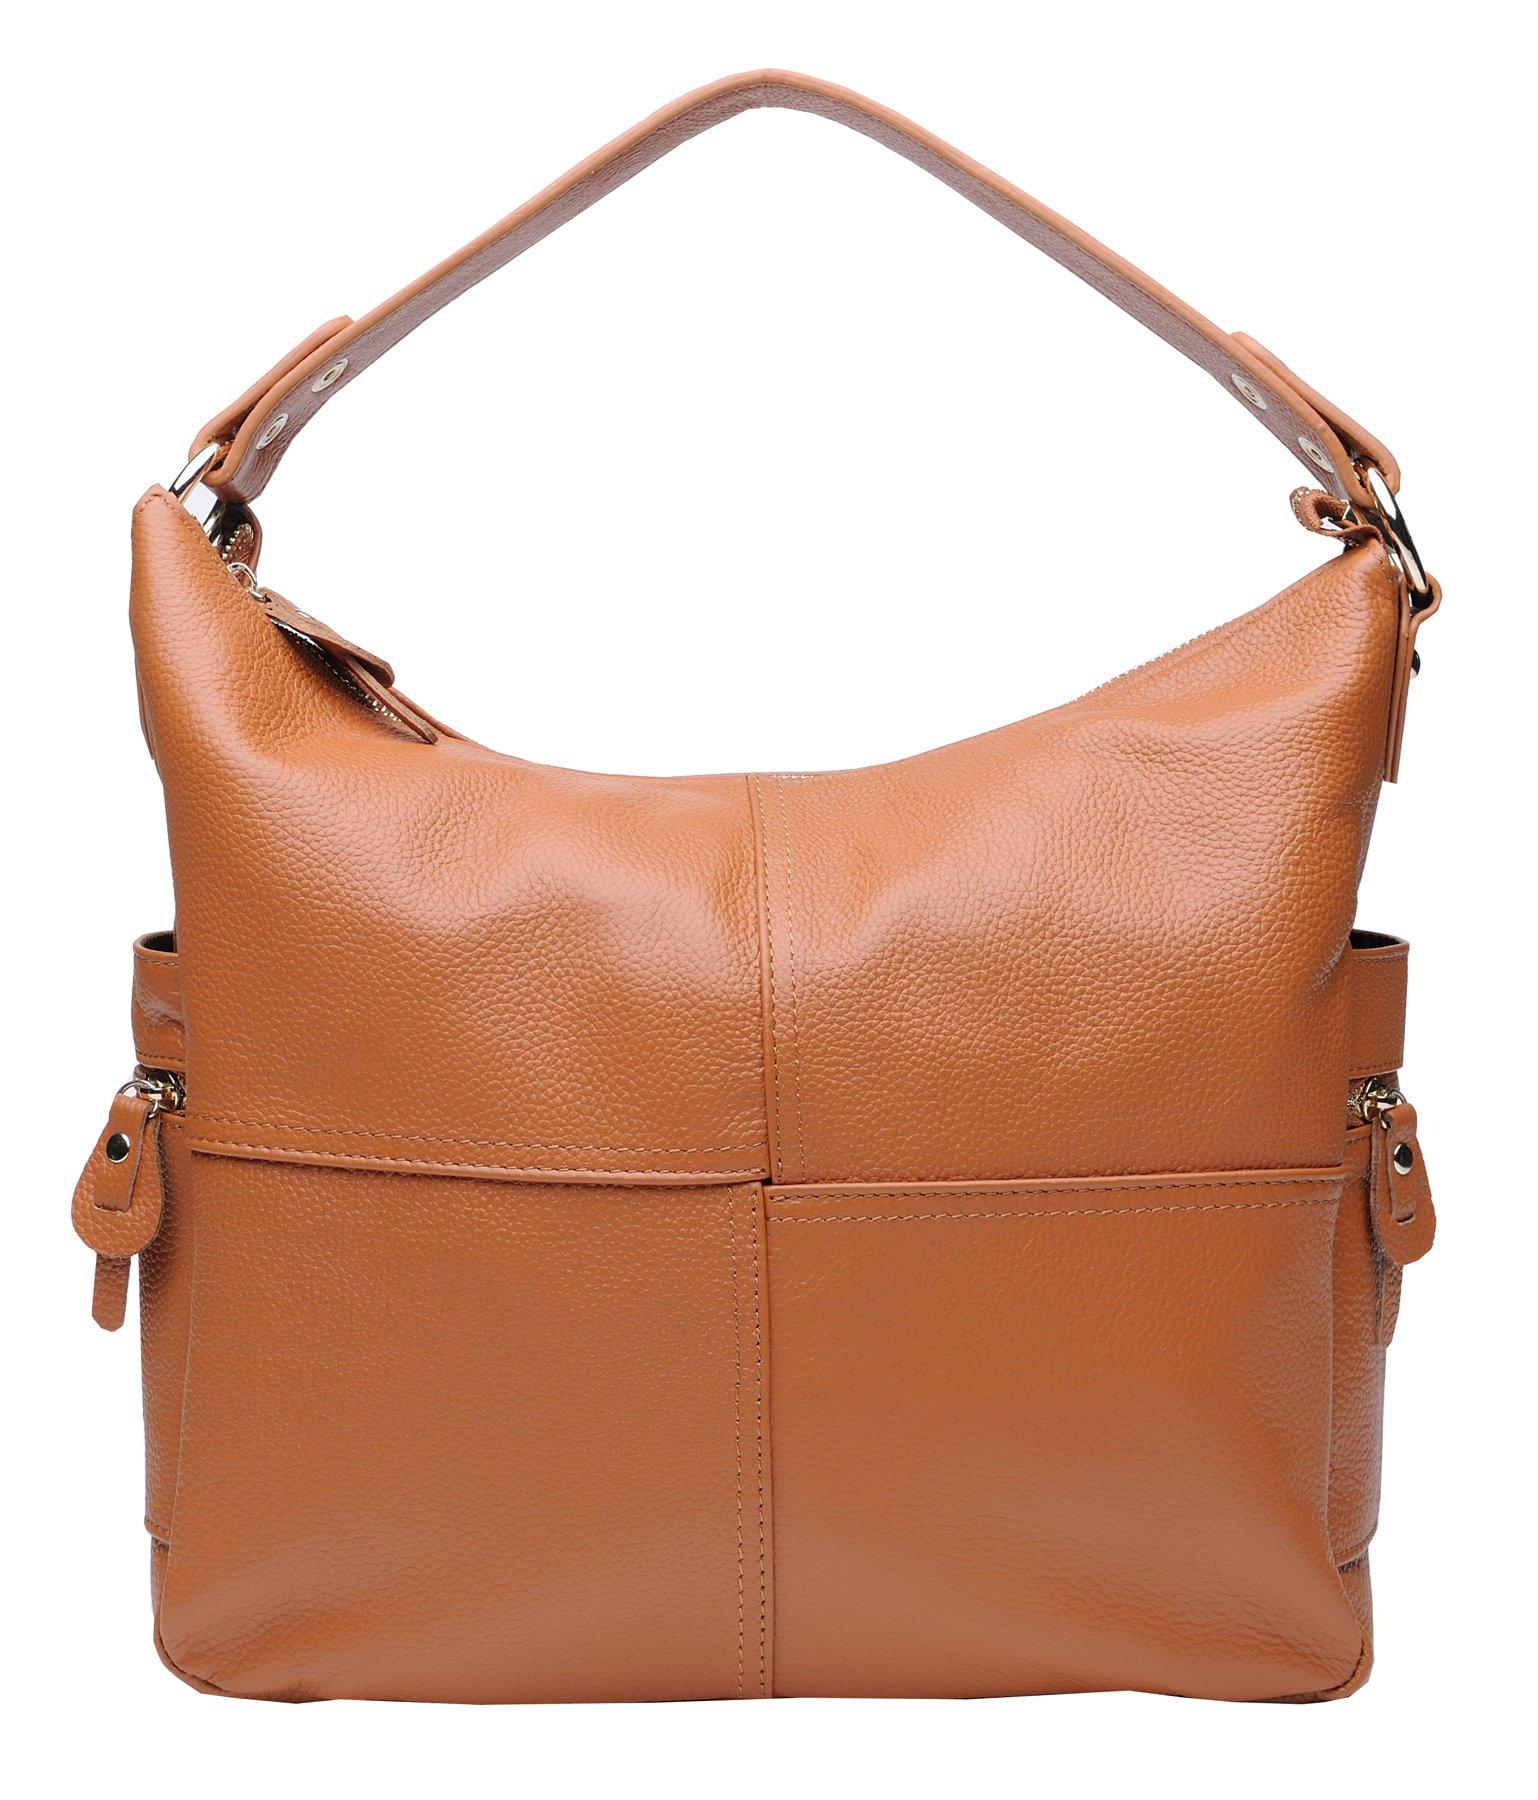 Heshe Soft Leather Women's Handbags Large Capacity Shoulder Bags Hobo Tote Top Handle Cross Body Bag Satchel Purses for Ladies (Brown)